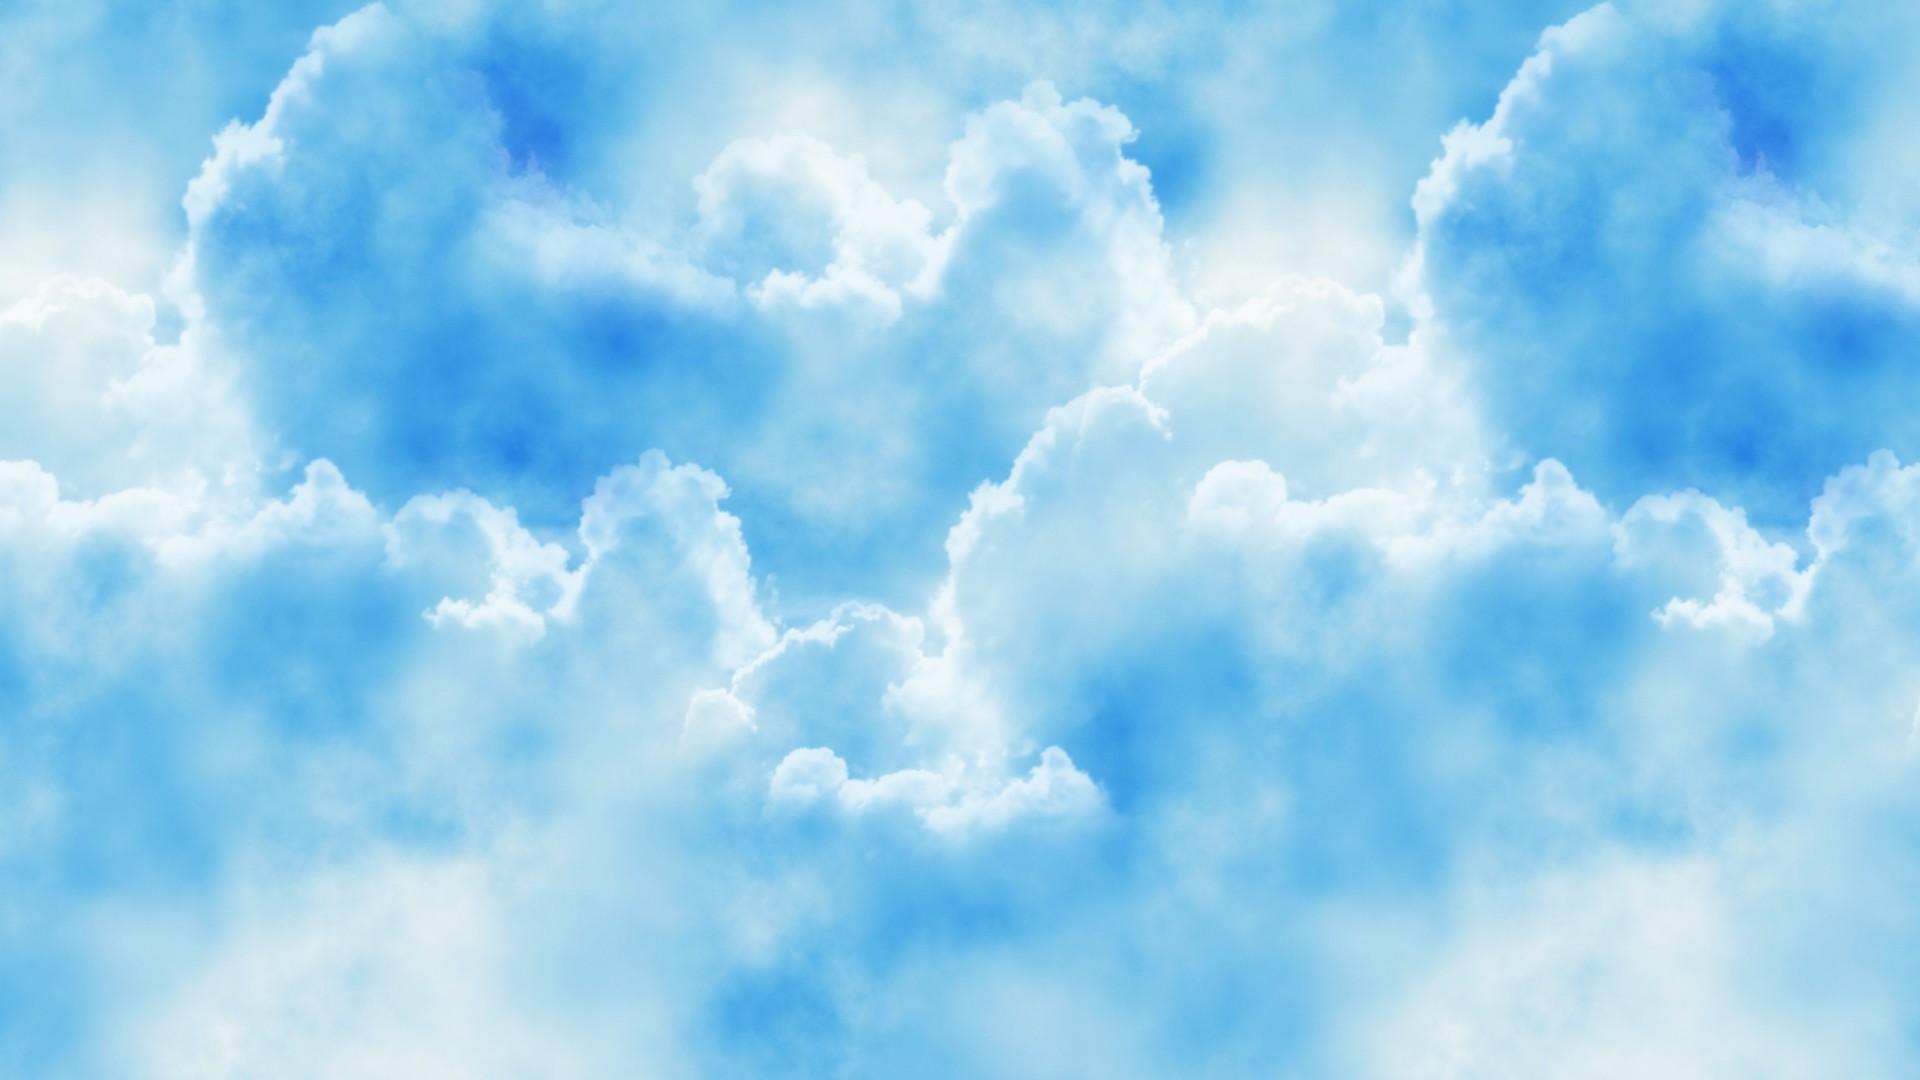 Blue Cloud wallpaper photo hd